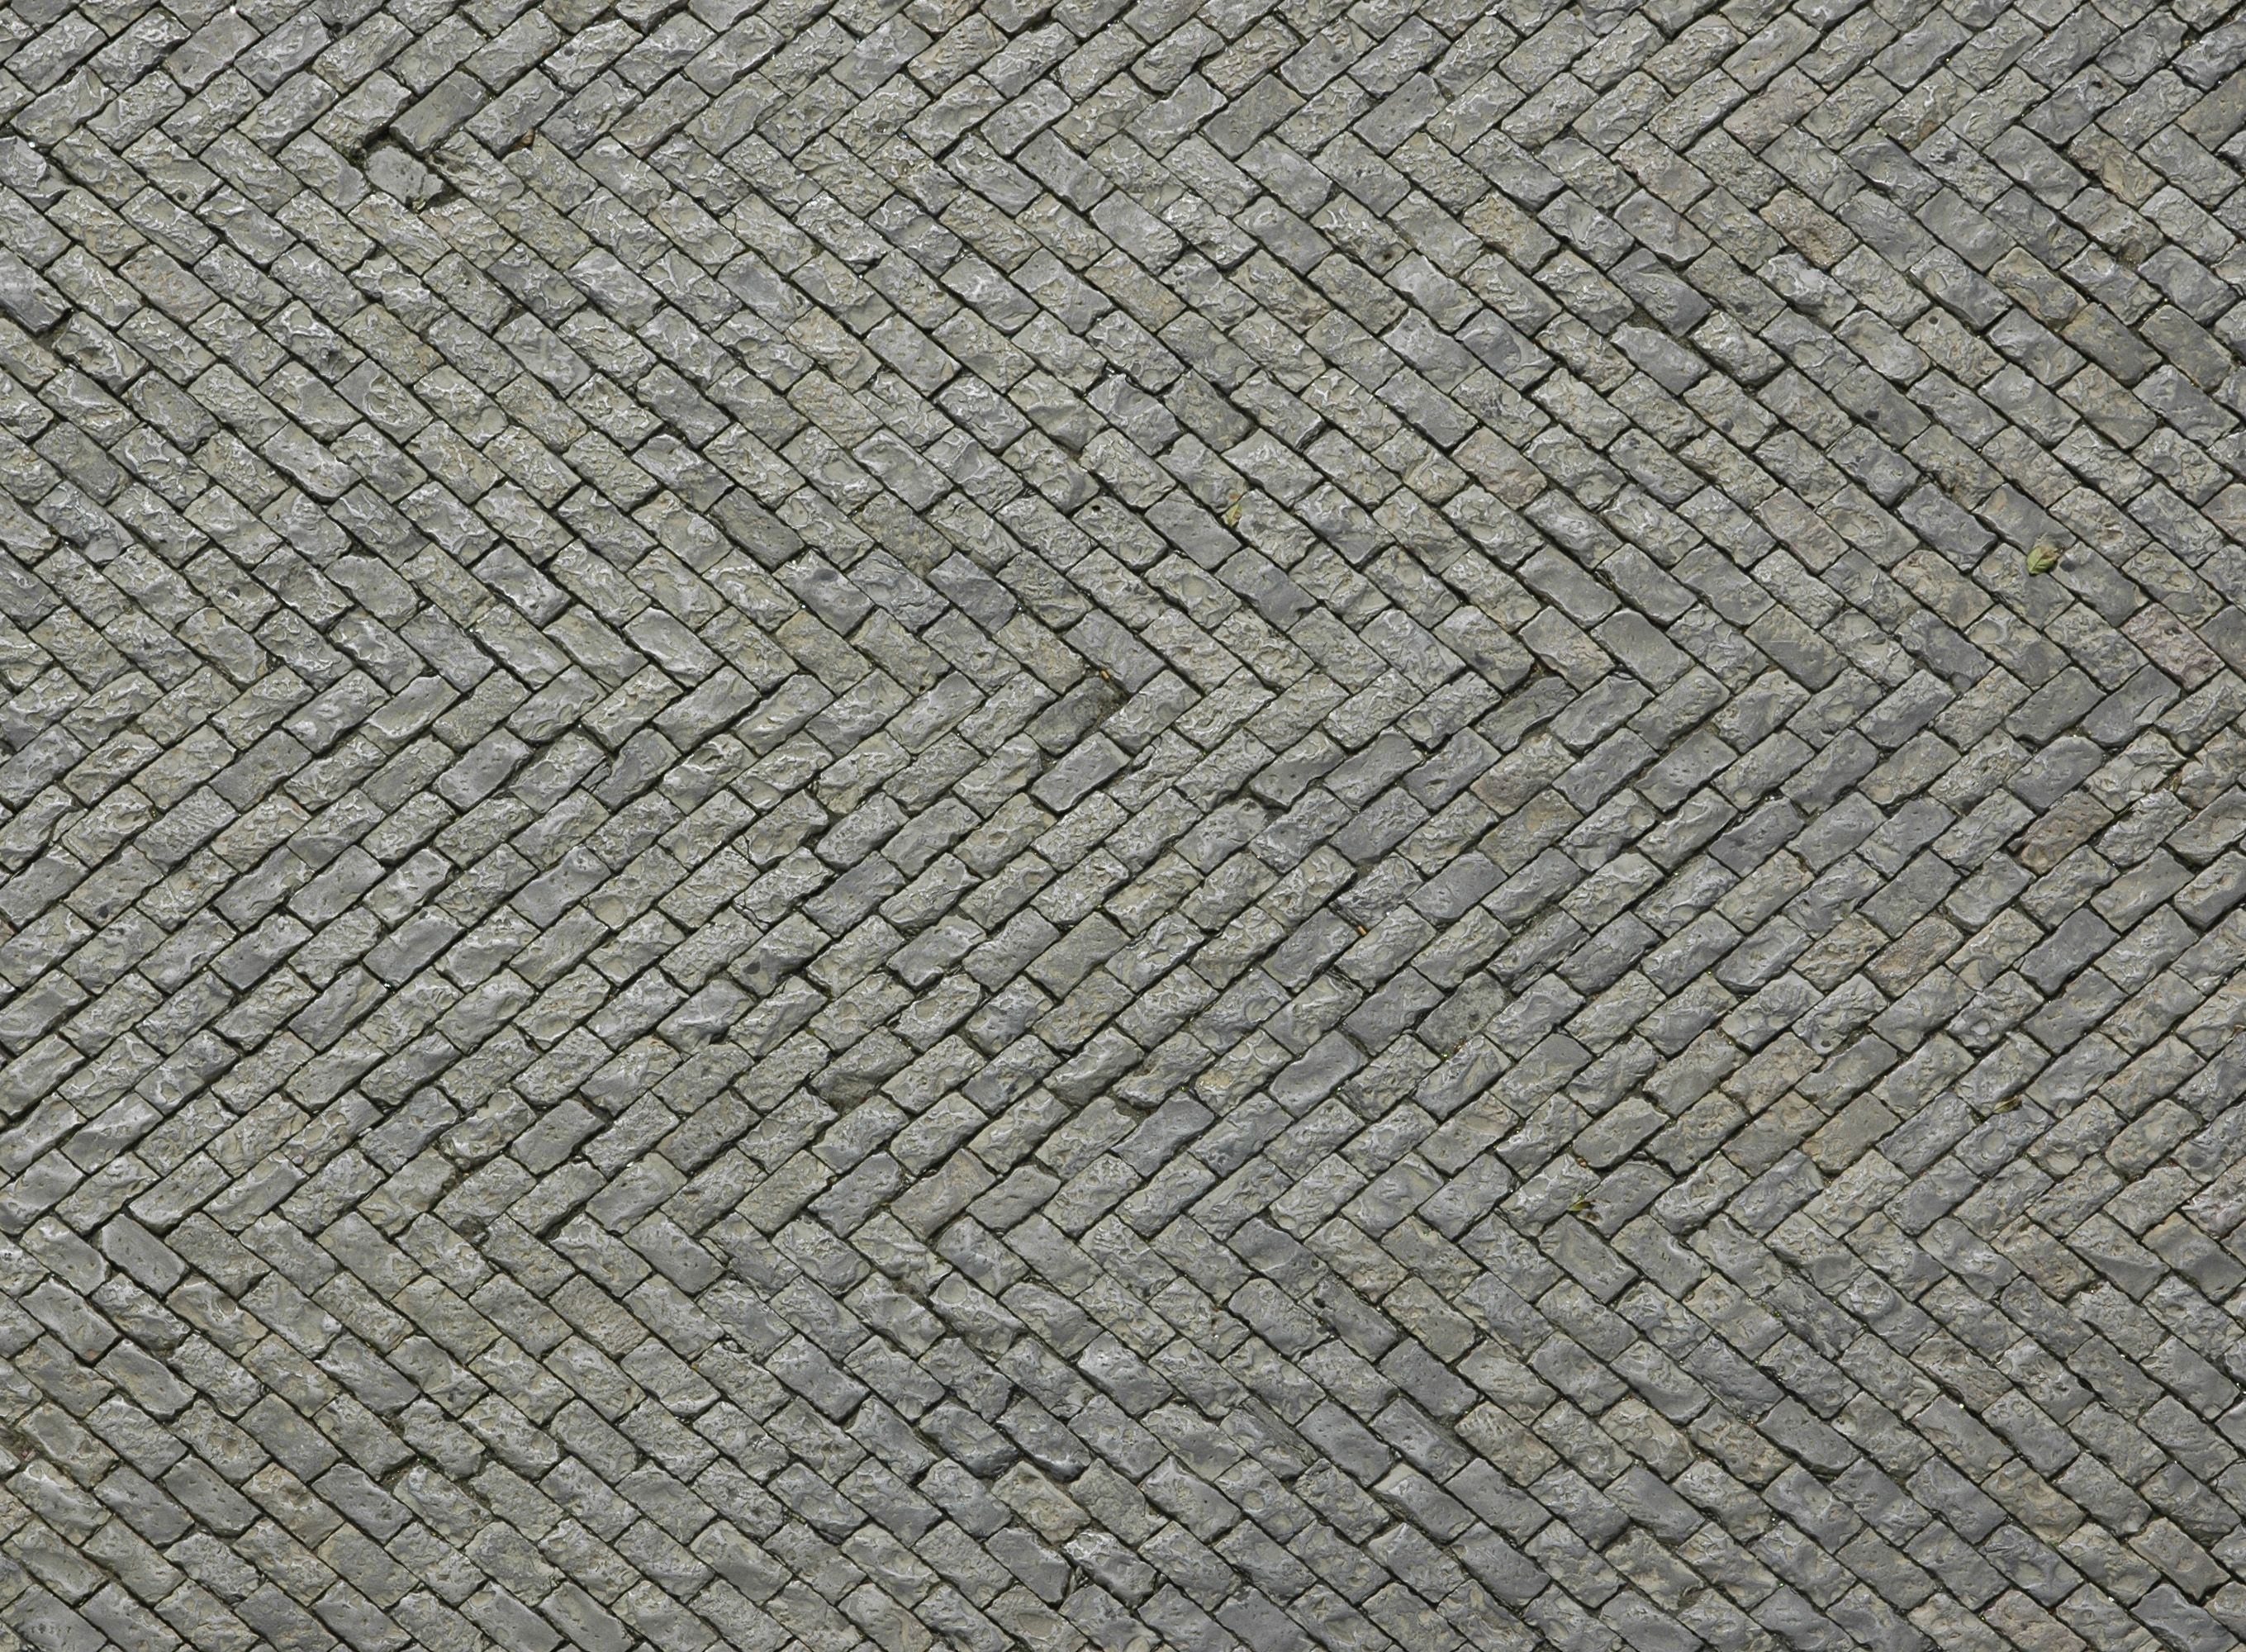 stone floor texture free image, stones | texturas | Pinterest ...